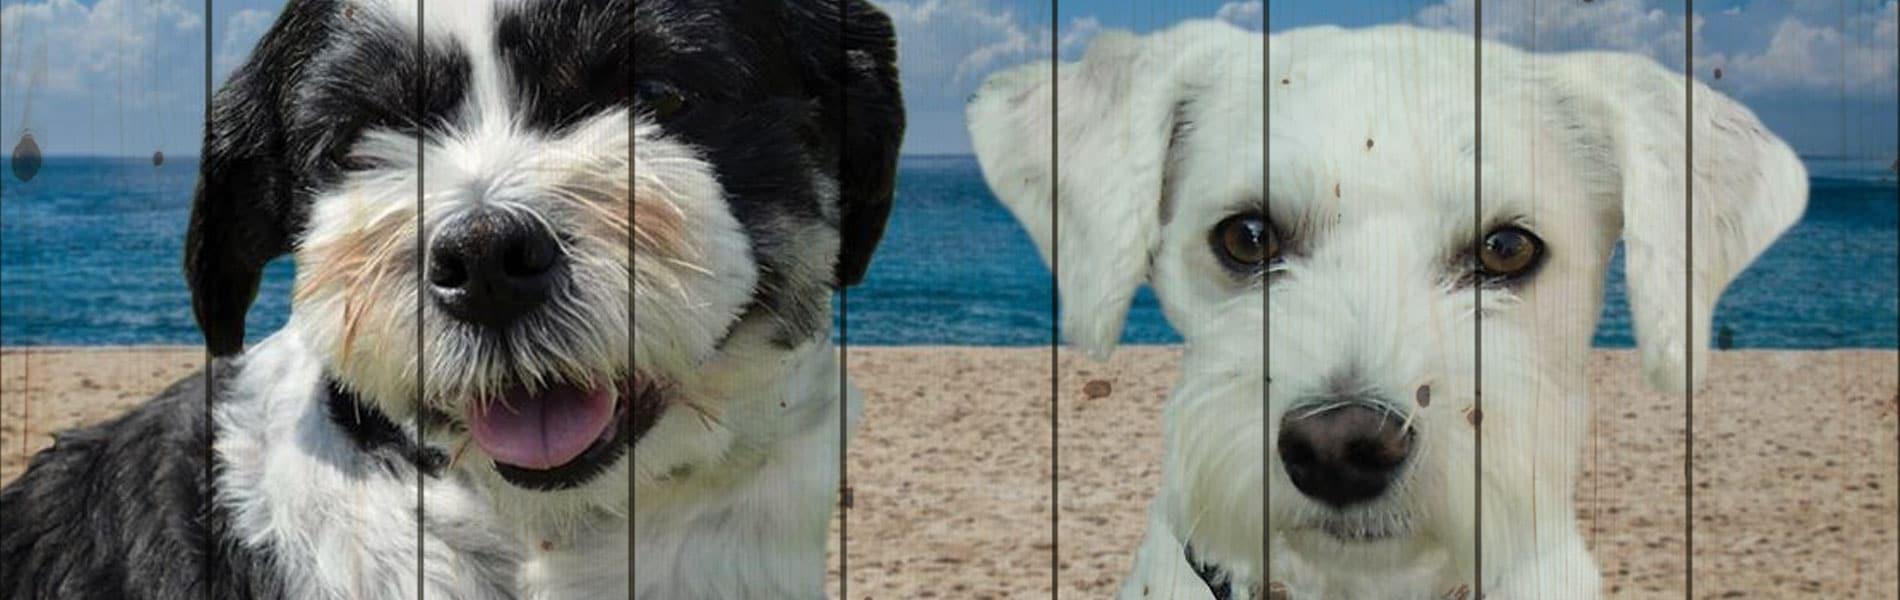 Een mooie dierbare herinnering van 2 lieve hondjes, geprint op hout